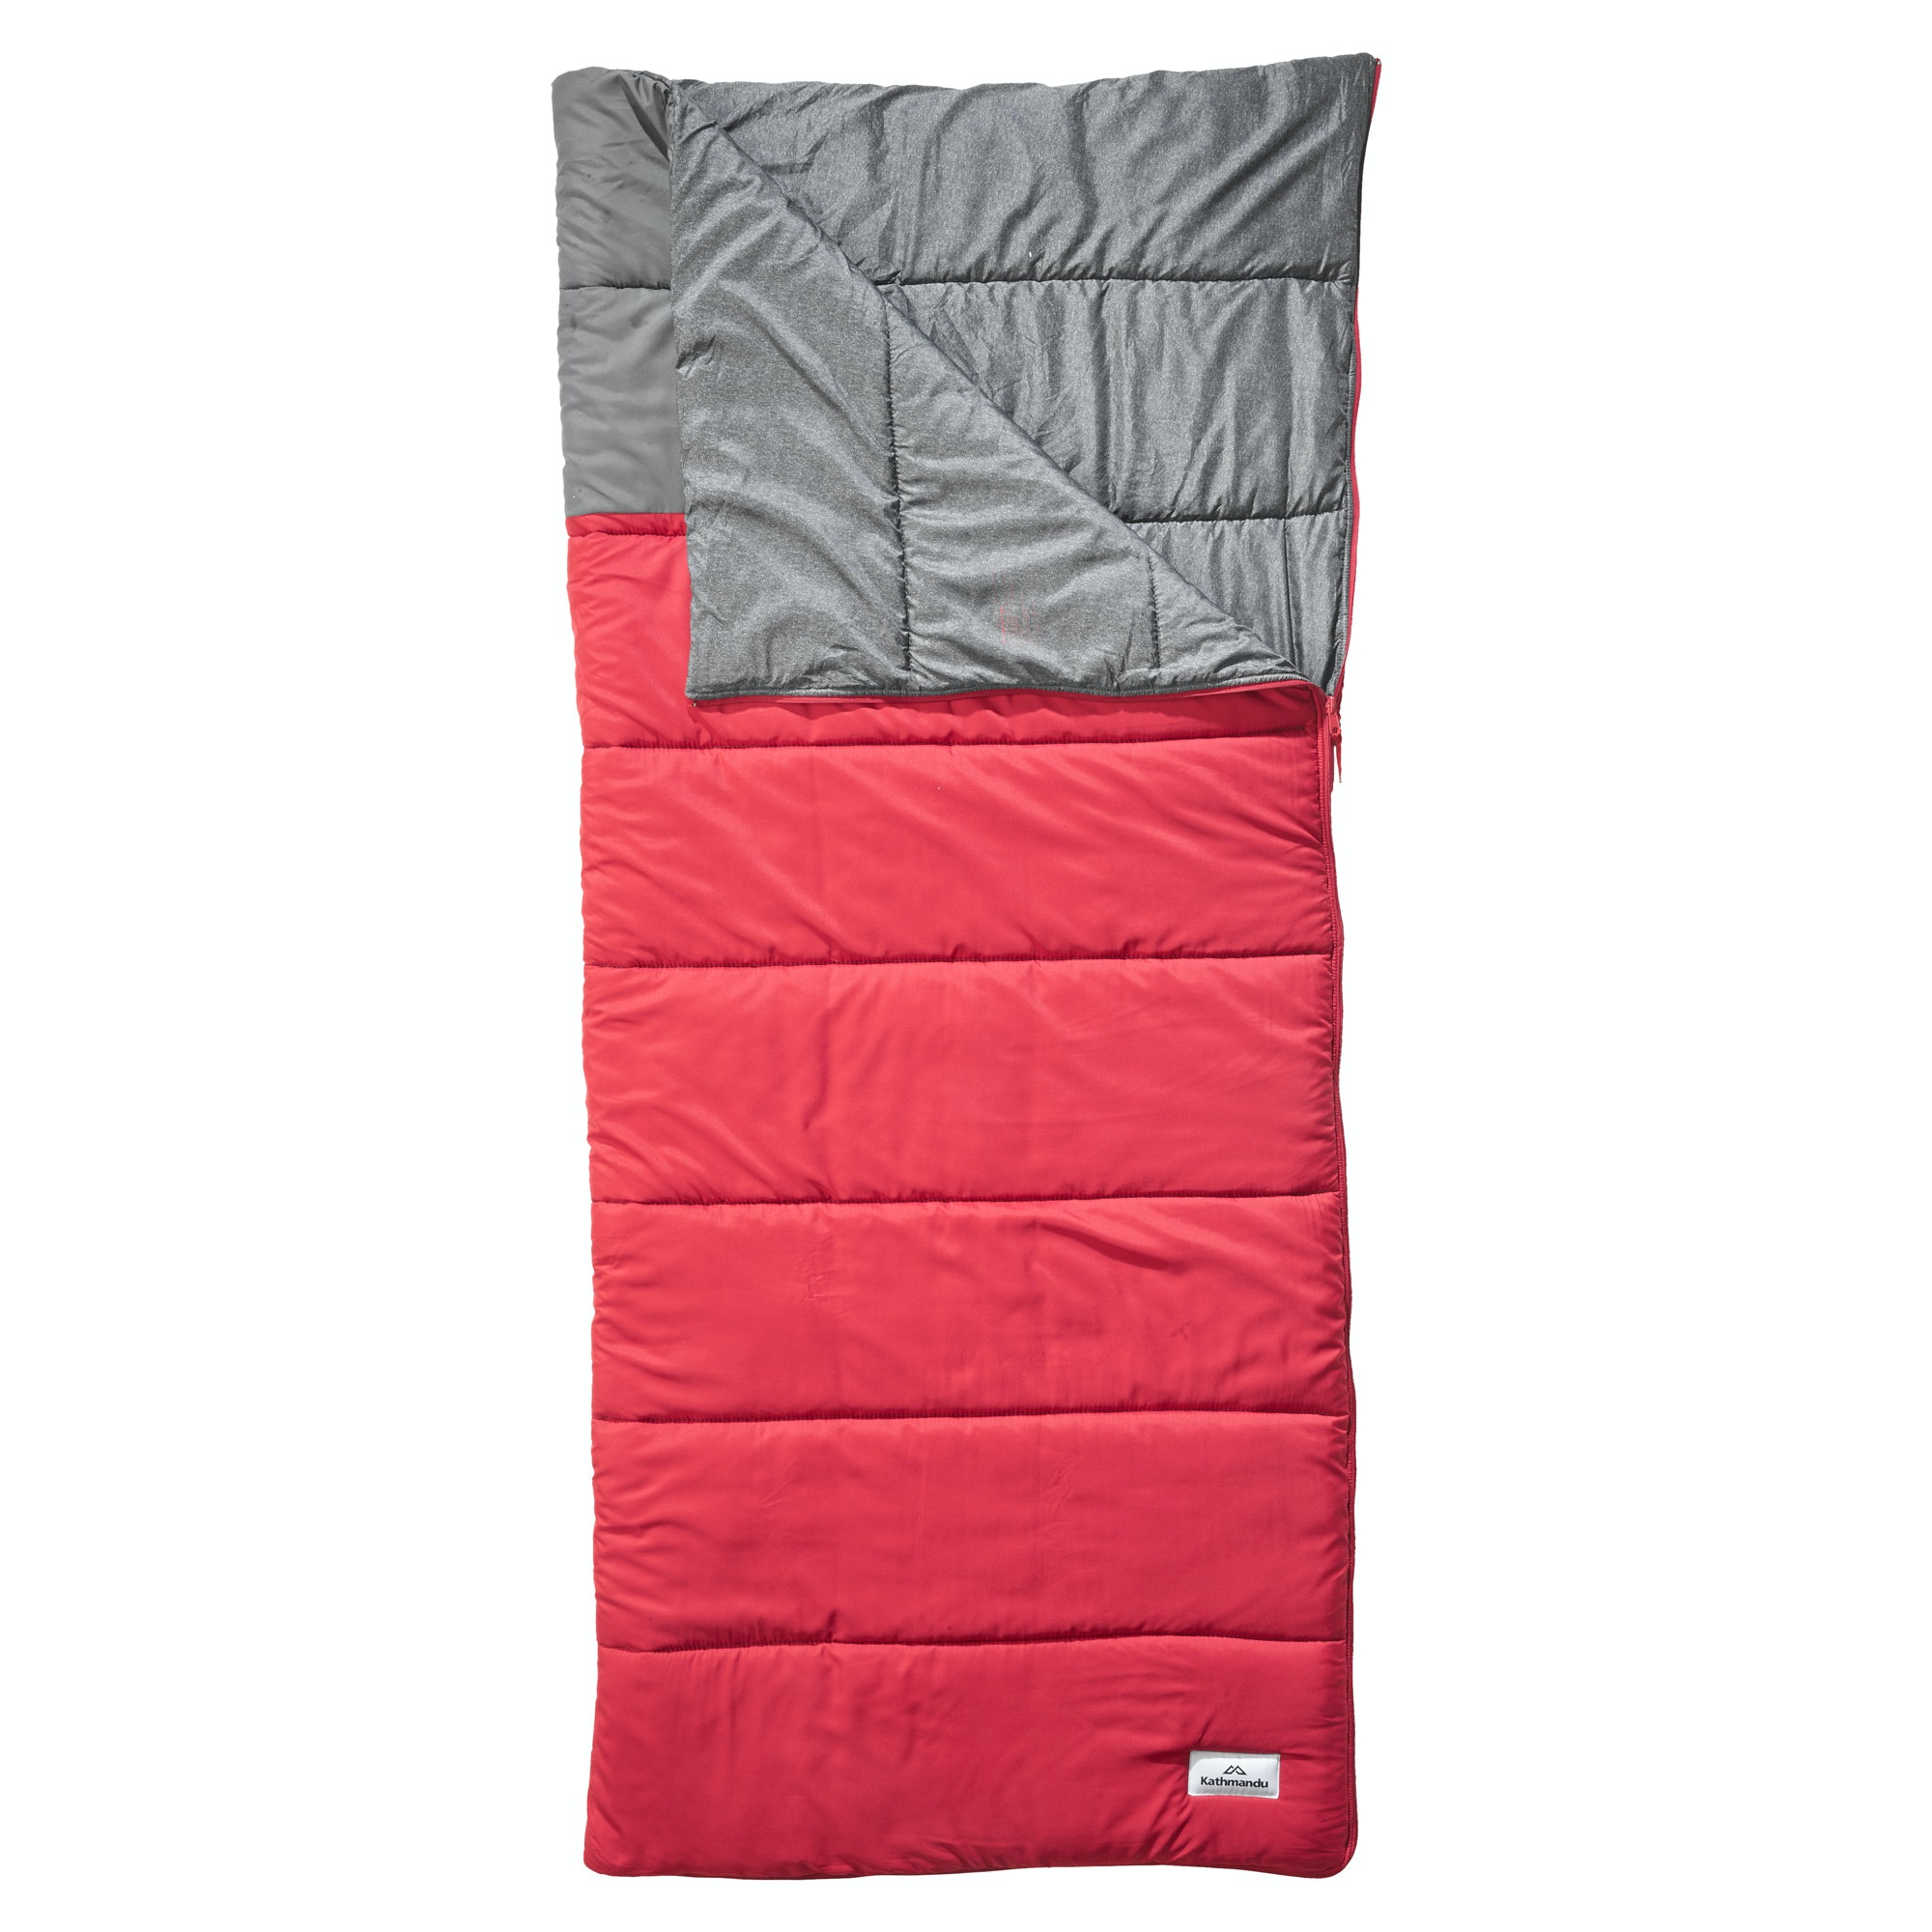 Roamer insuLITE Synthetic Sleeping Bag